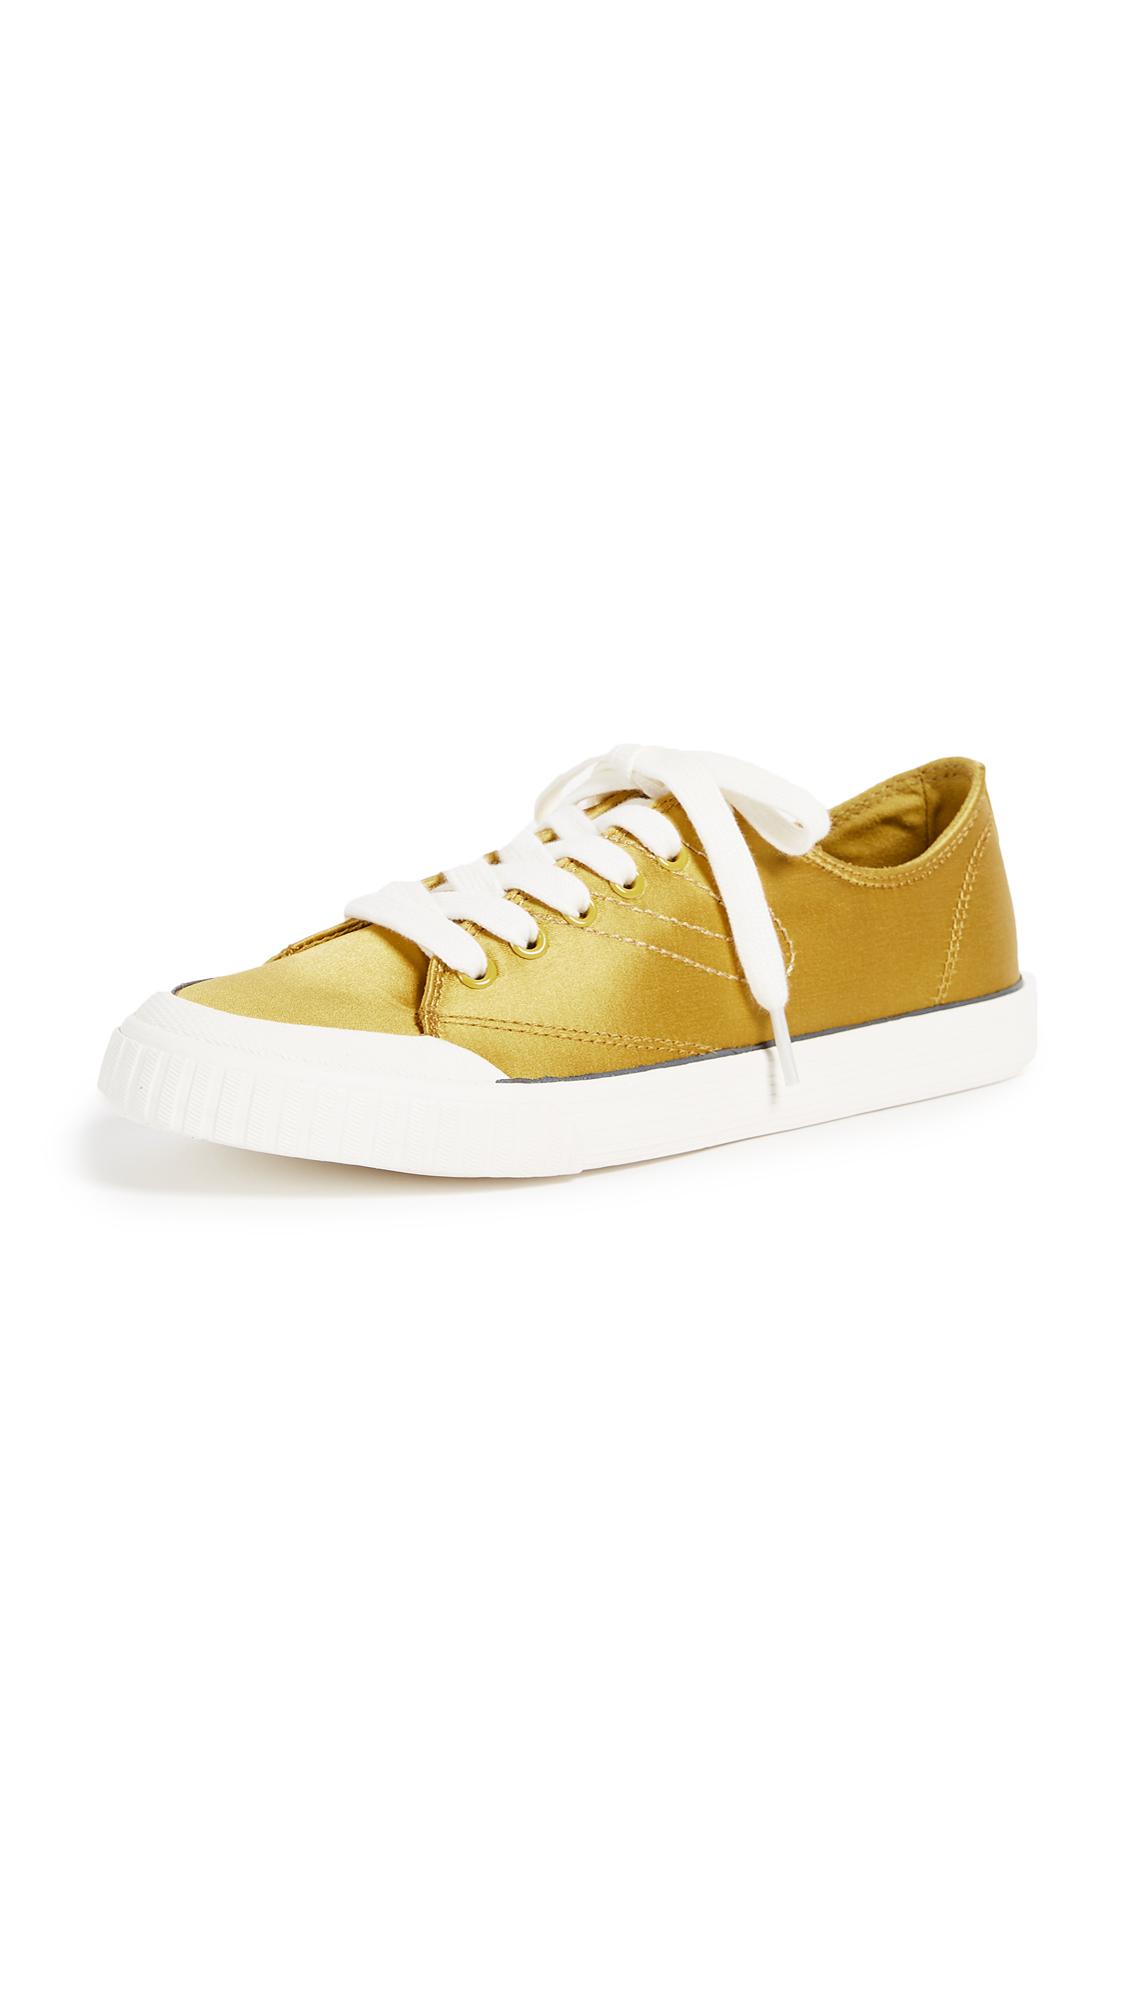 Tretorn Marley Classic Sneakers - Yellow/Tretorn White